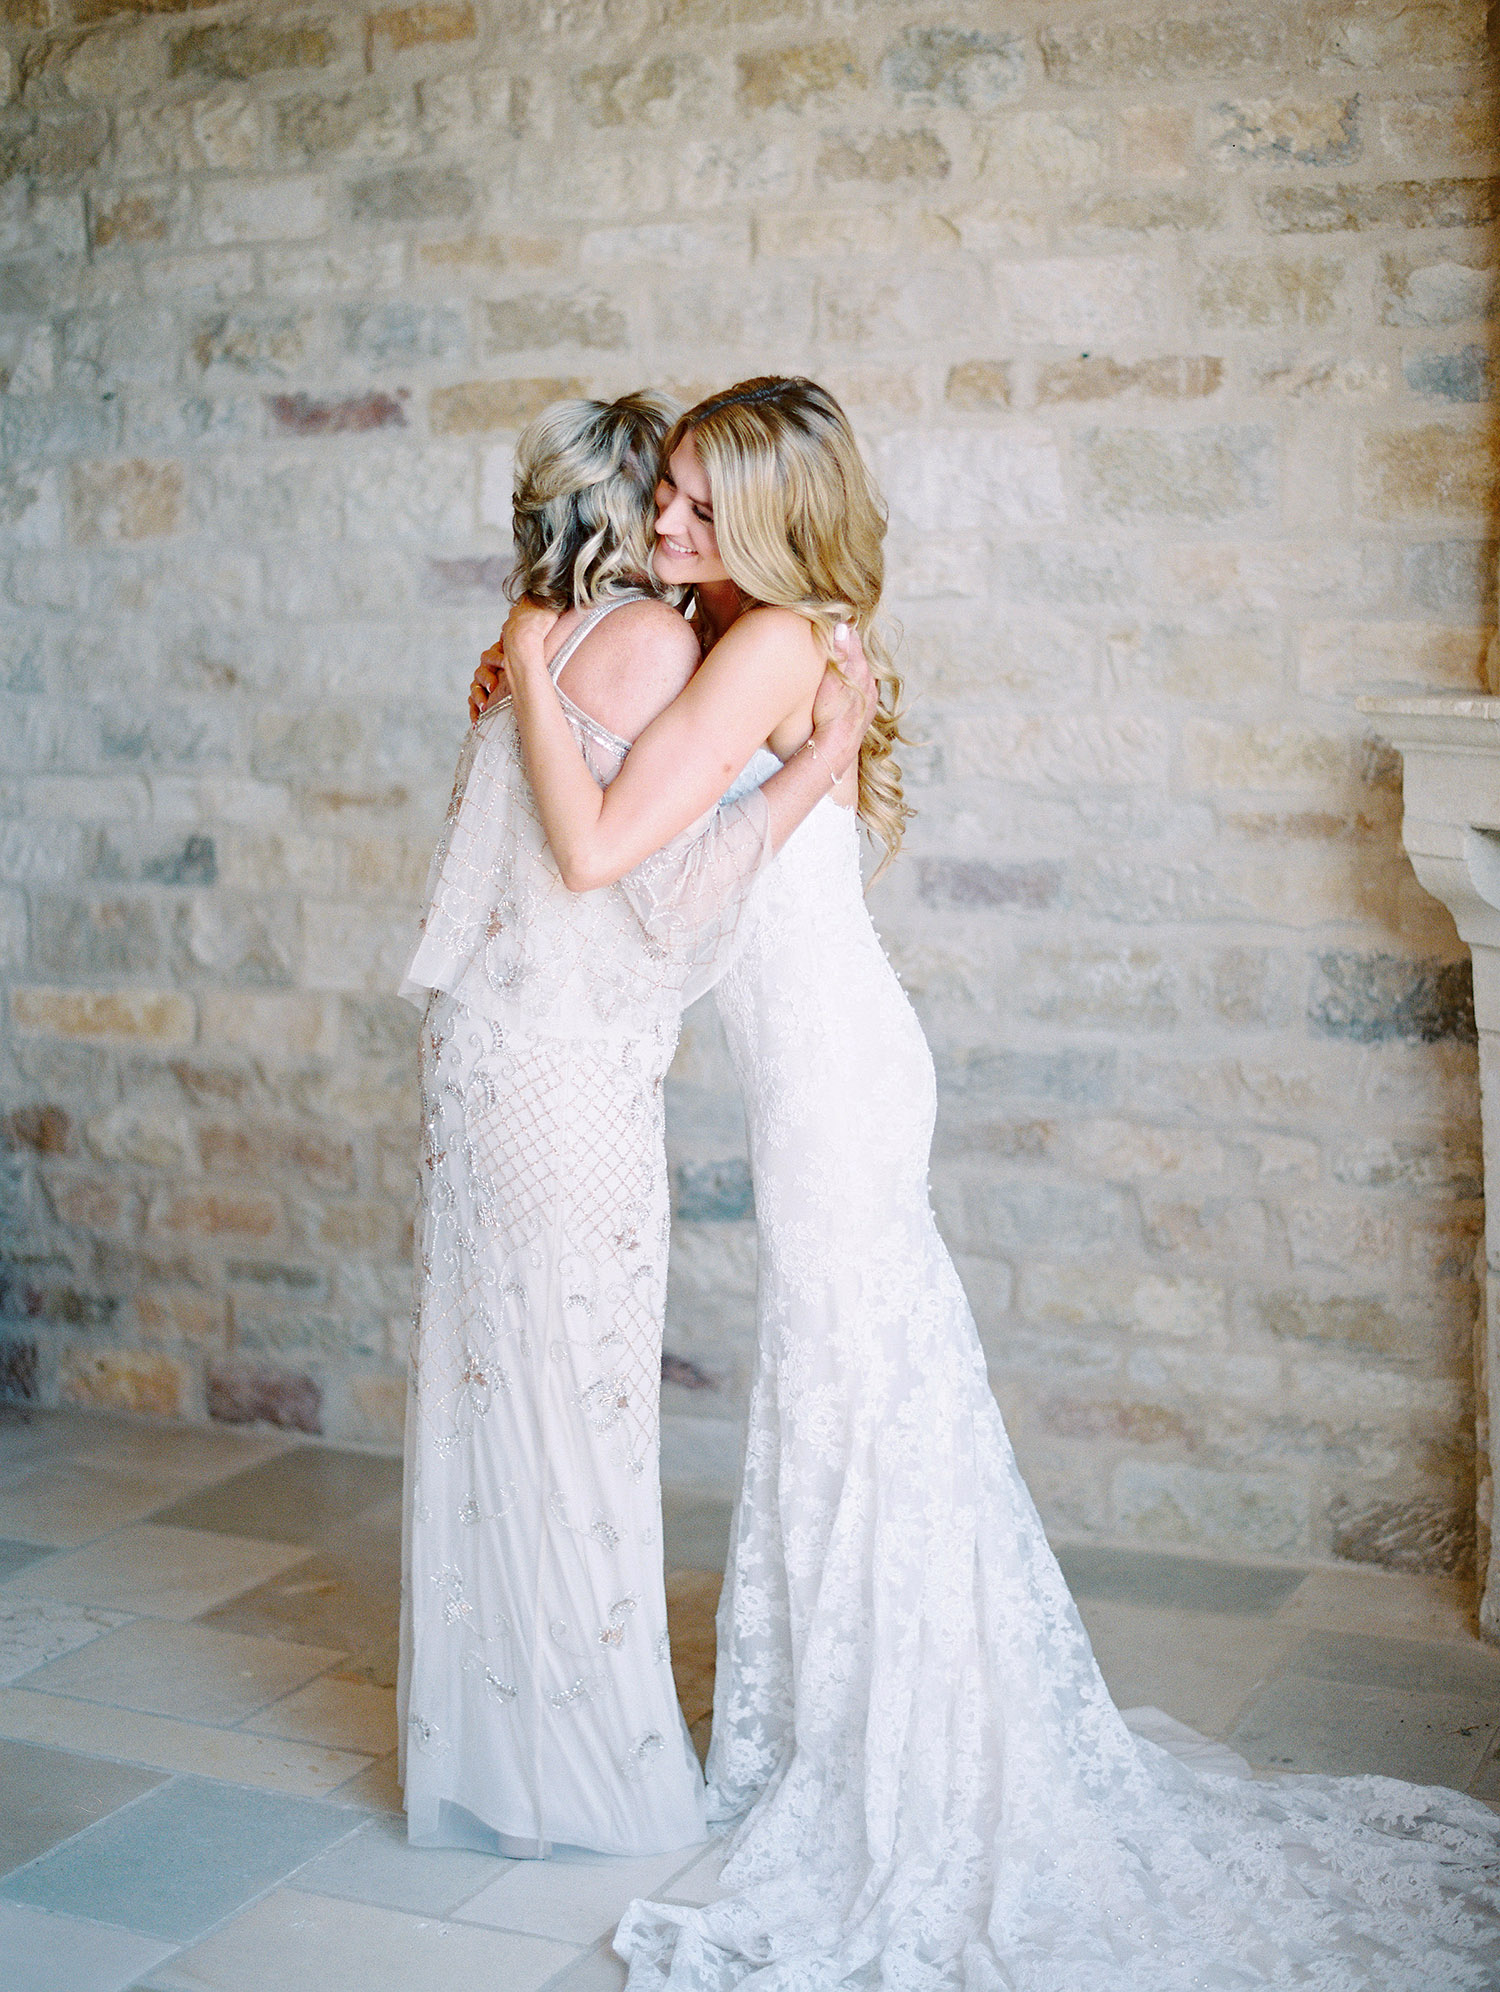 kati erik wedding bride and mother hug